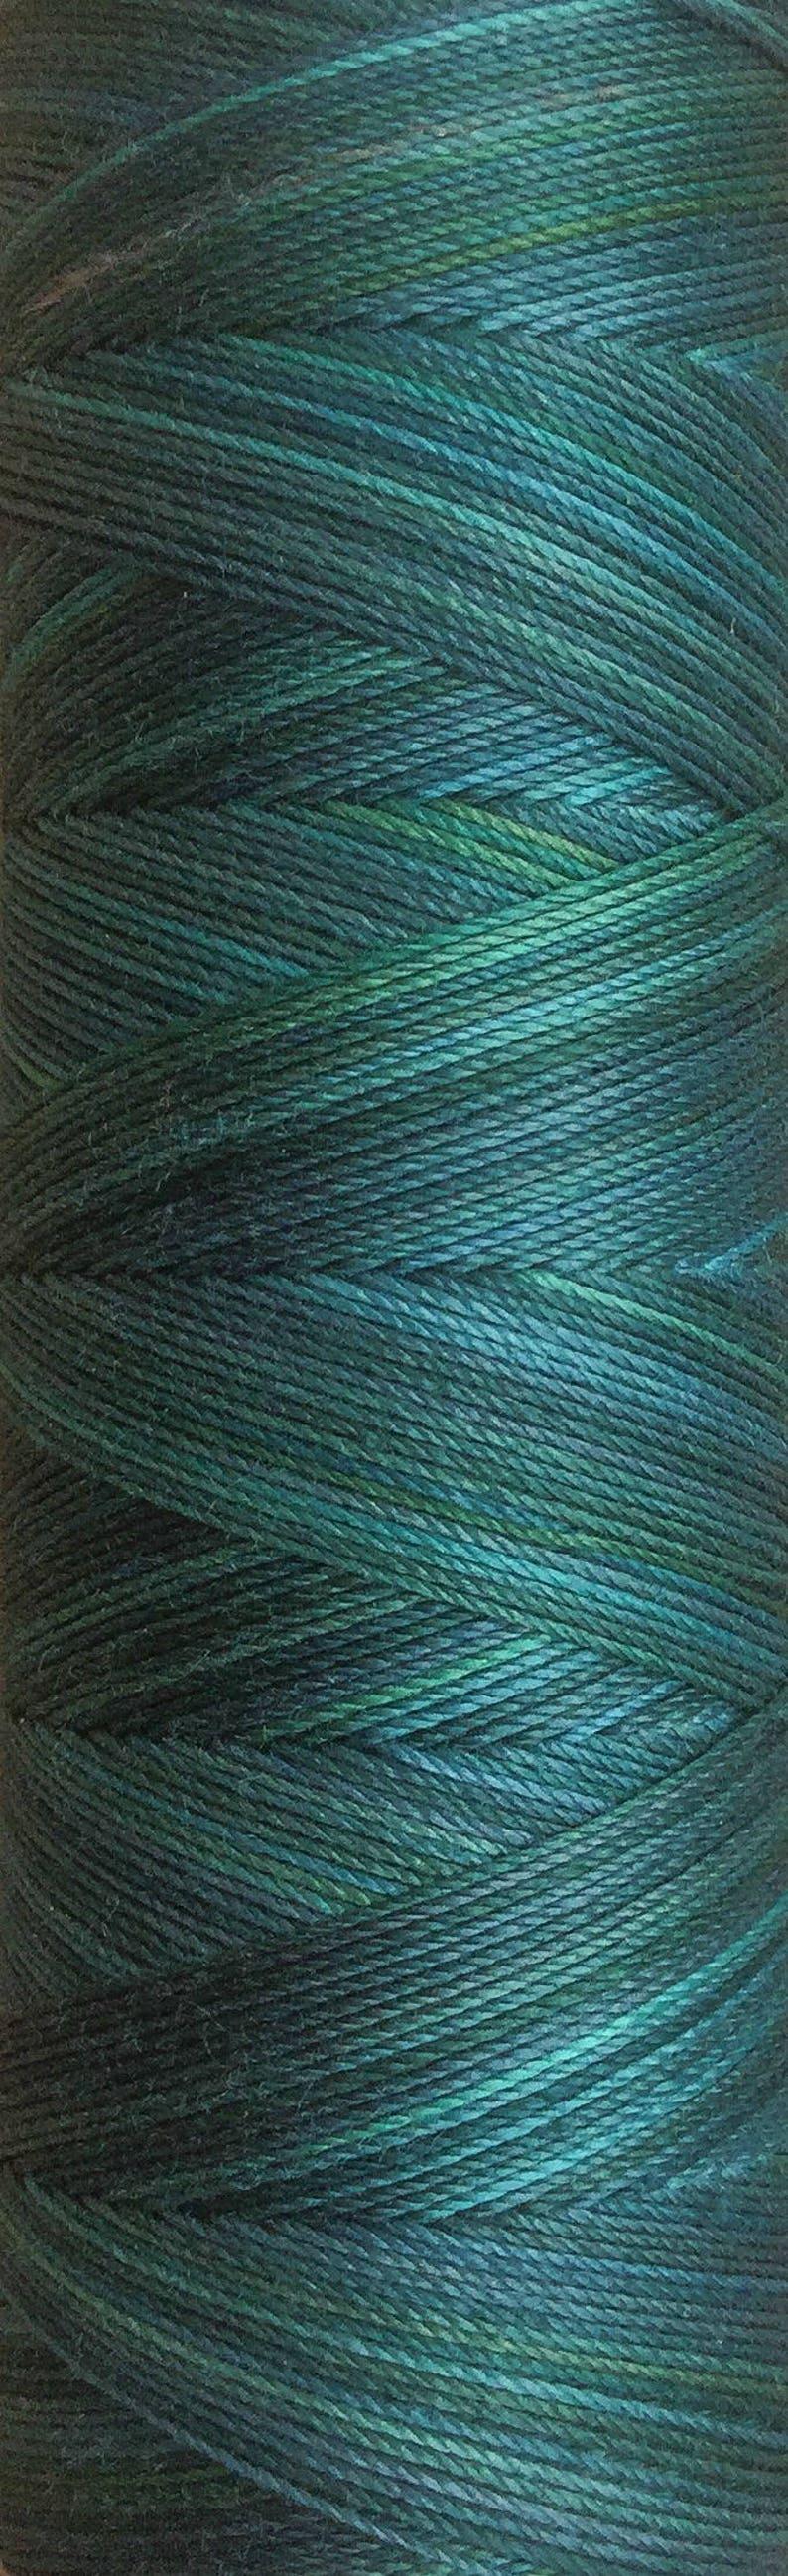 No.06 Petrol Hand Dyed Cotton Machine Thread Individual image 0